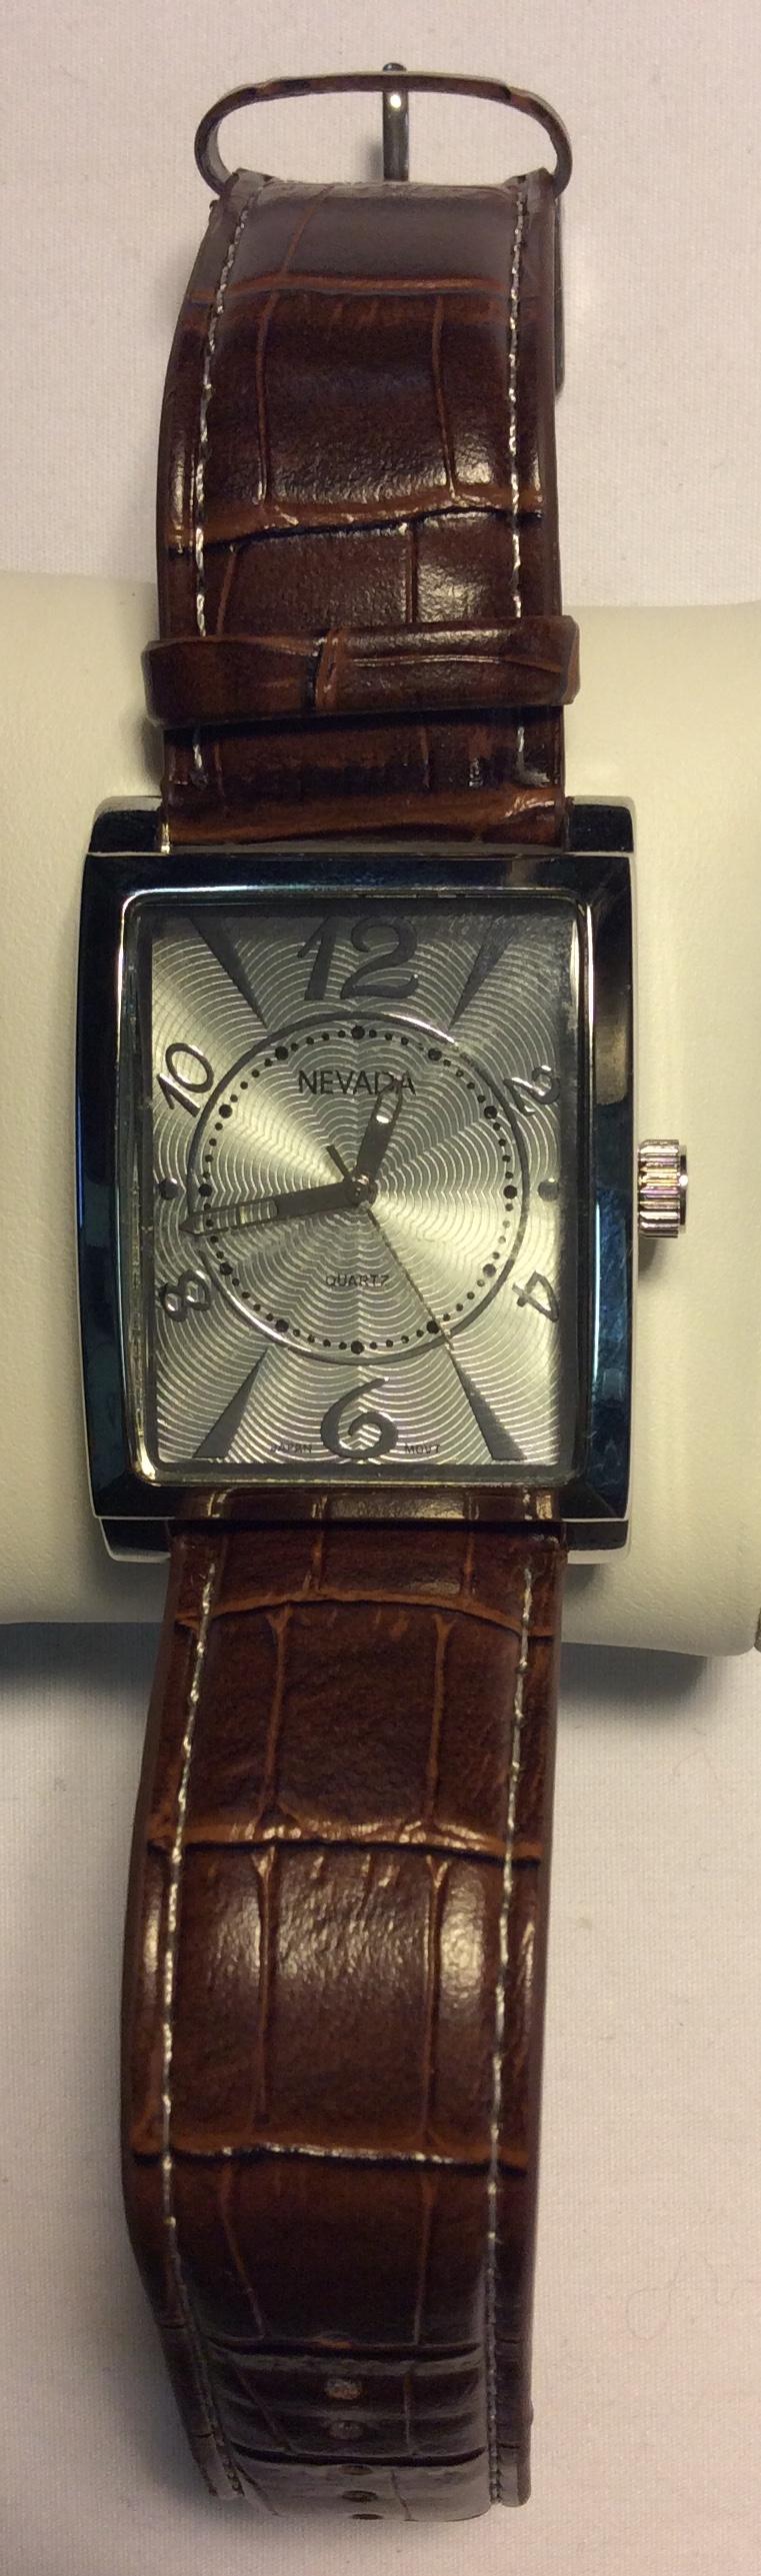 Nevada watch - rectangular silver